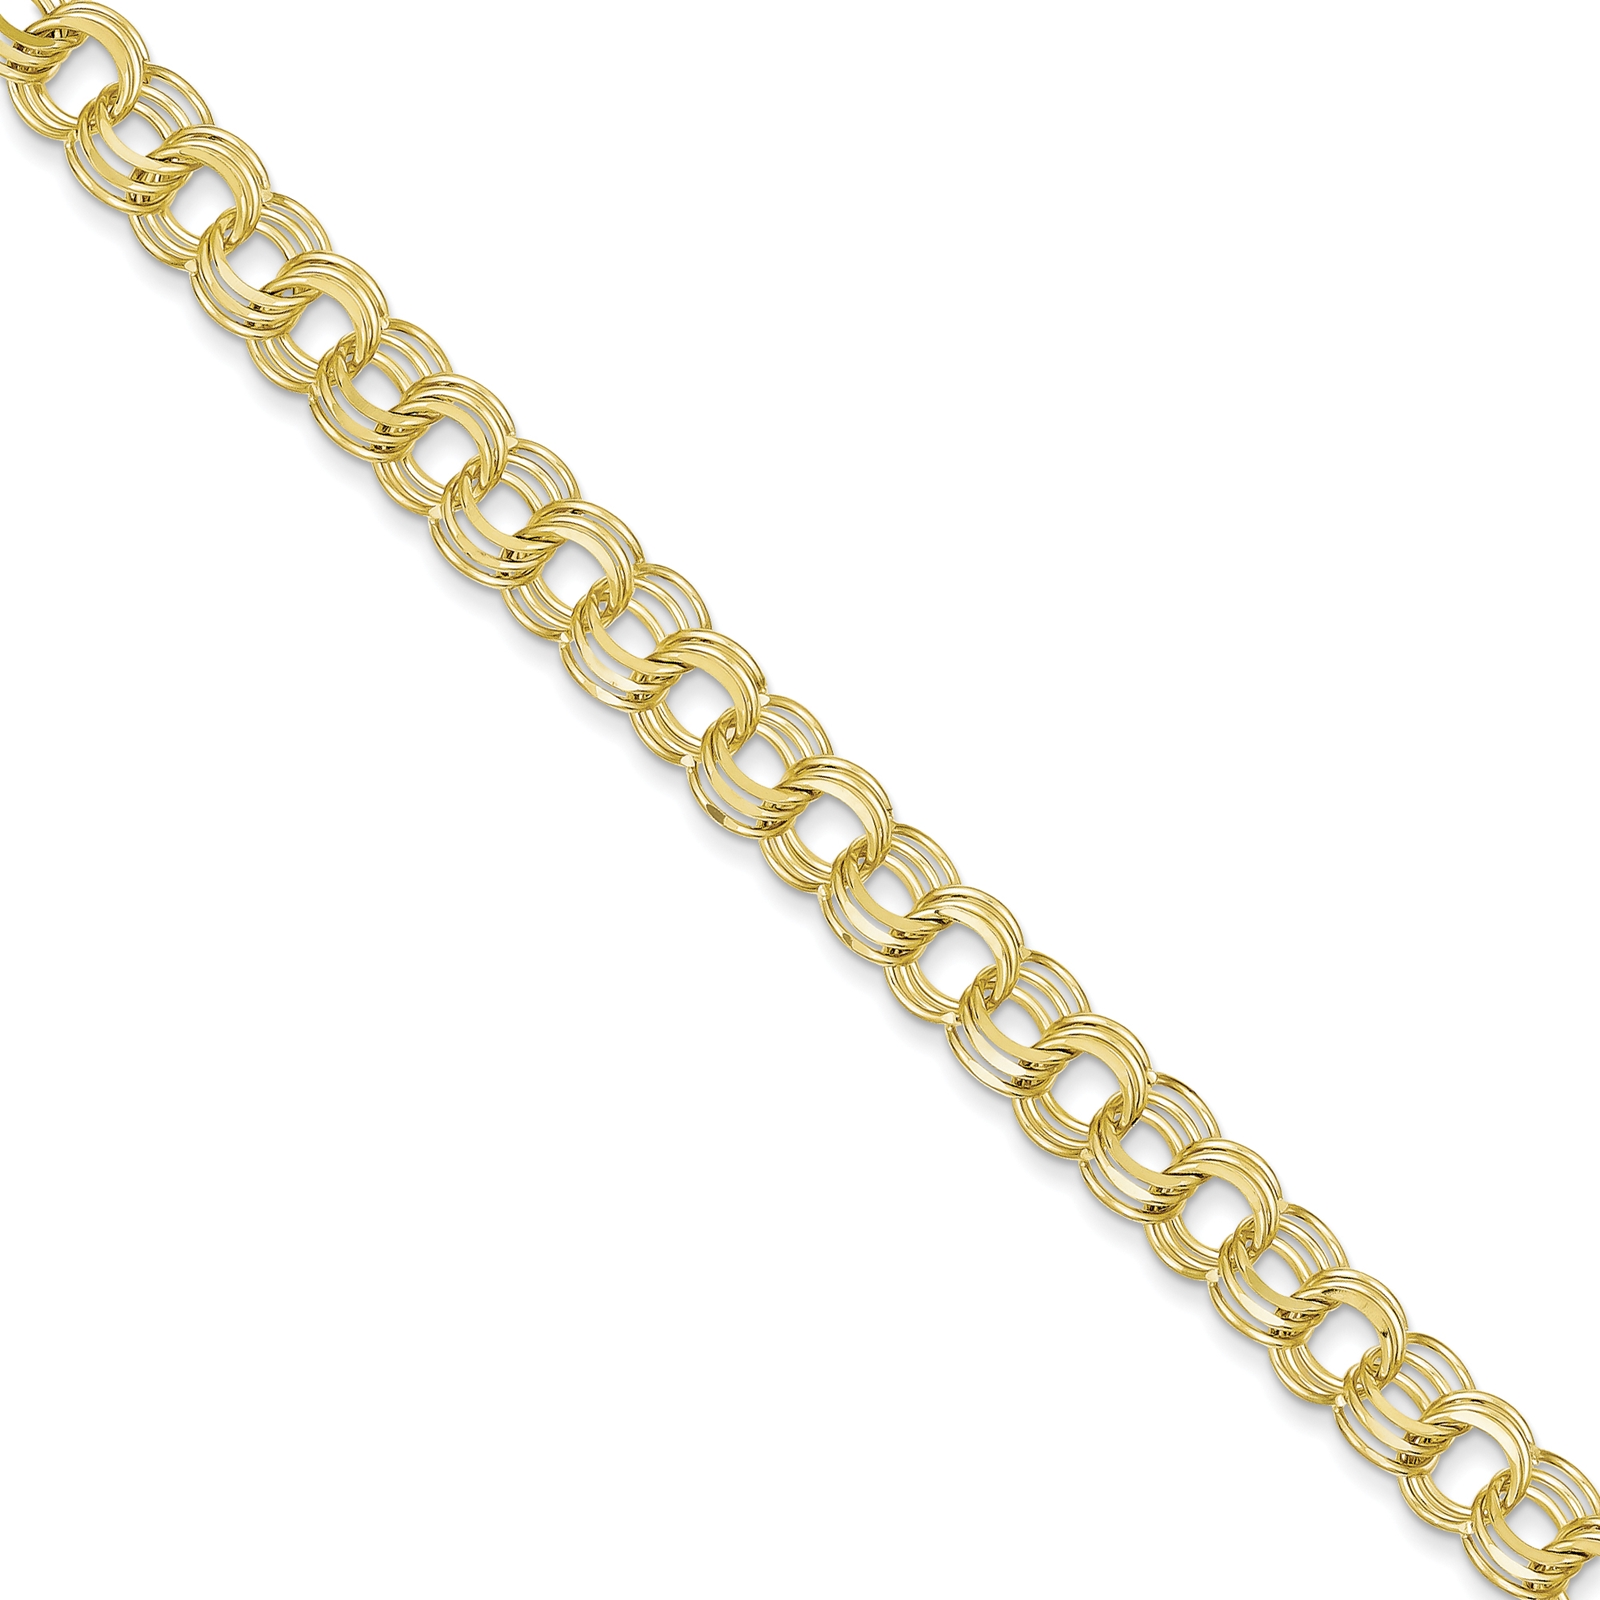 "10k Yellow Gold Polished & Solid 7mm Triple Link Charm Bracelet 7"""